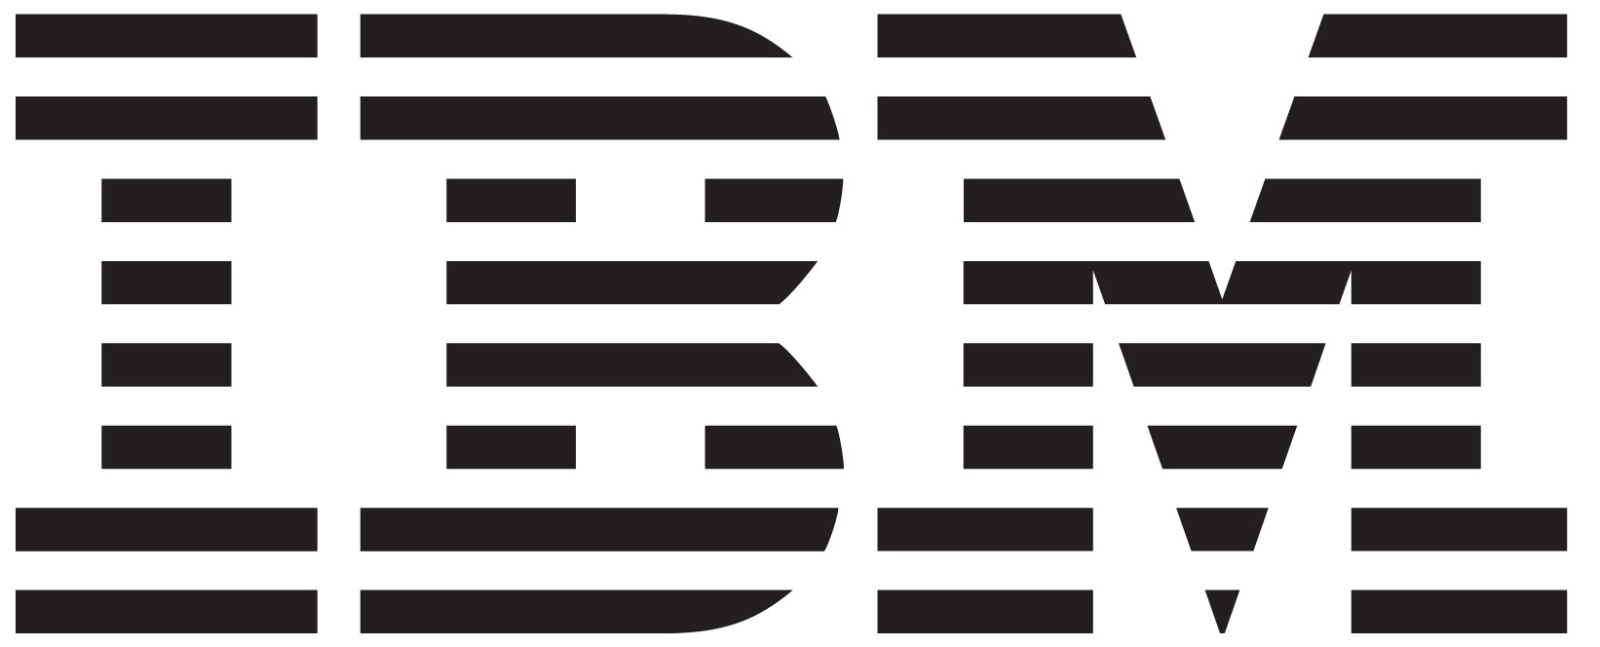 logo ibm partenaire ipm france bornes interactives tactiles